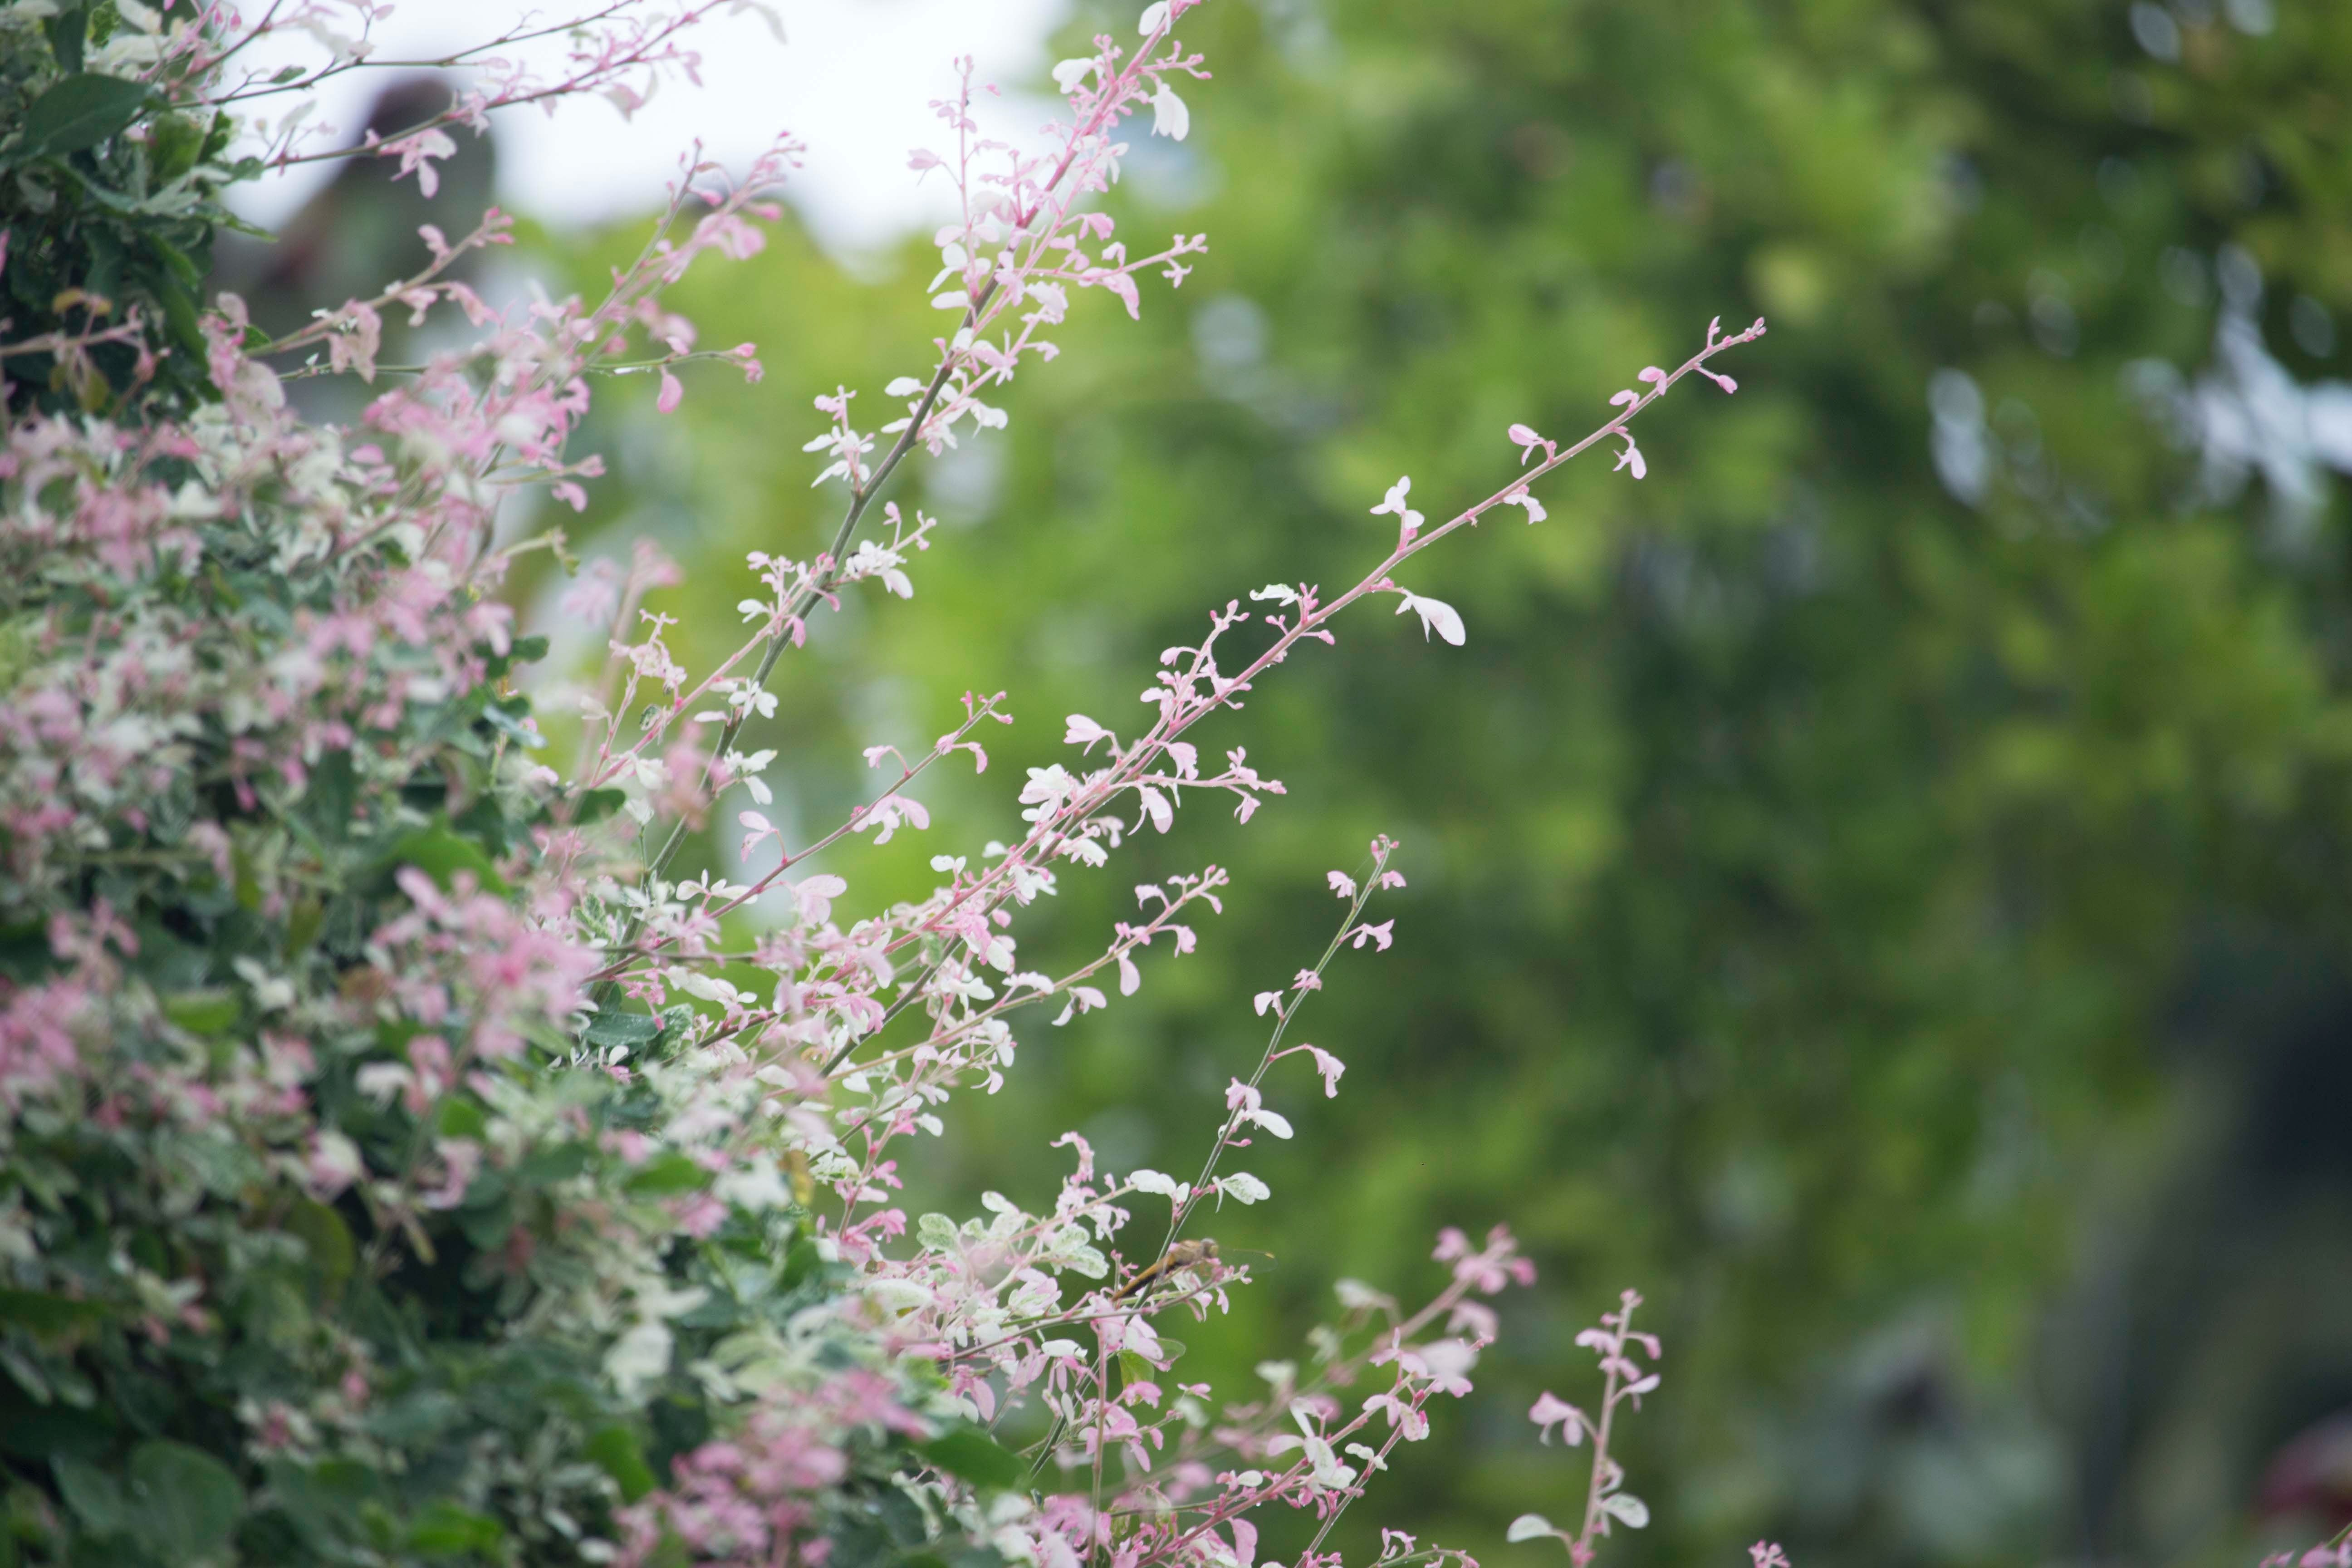 Pink petaled flower during daytime photo